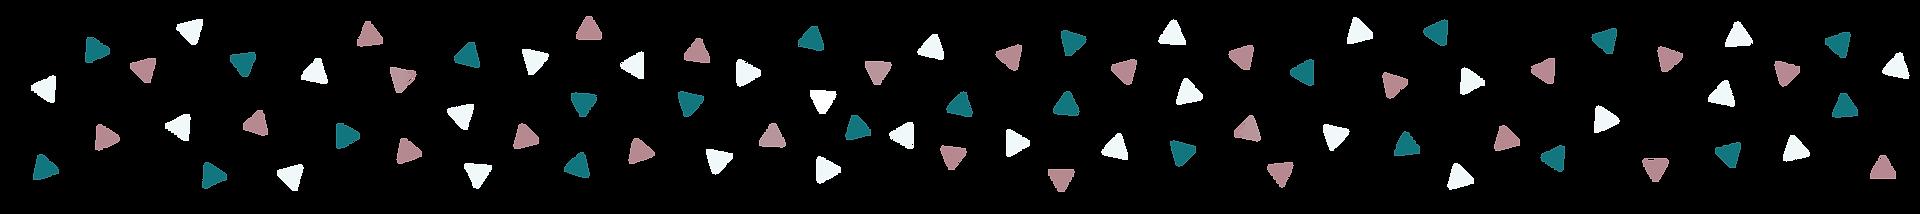 Arrows-02.png